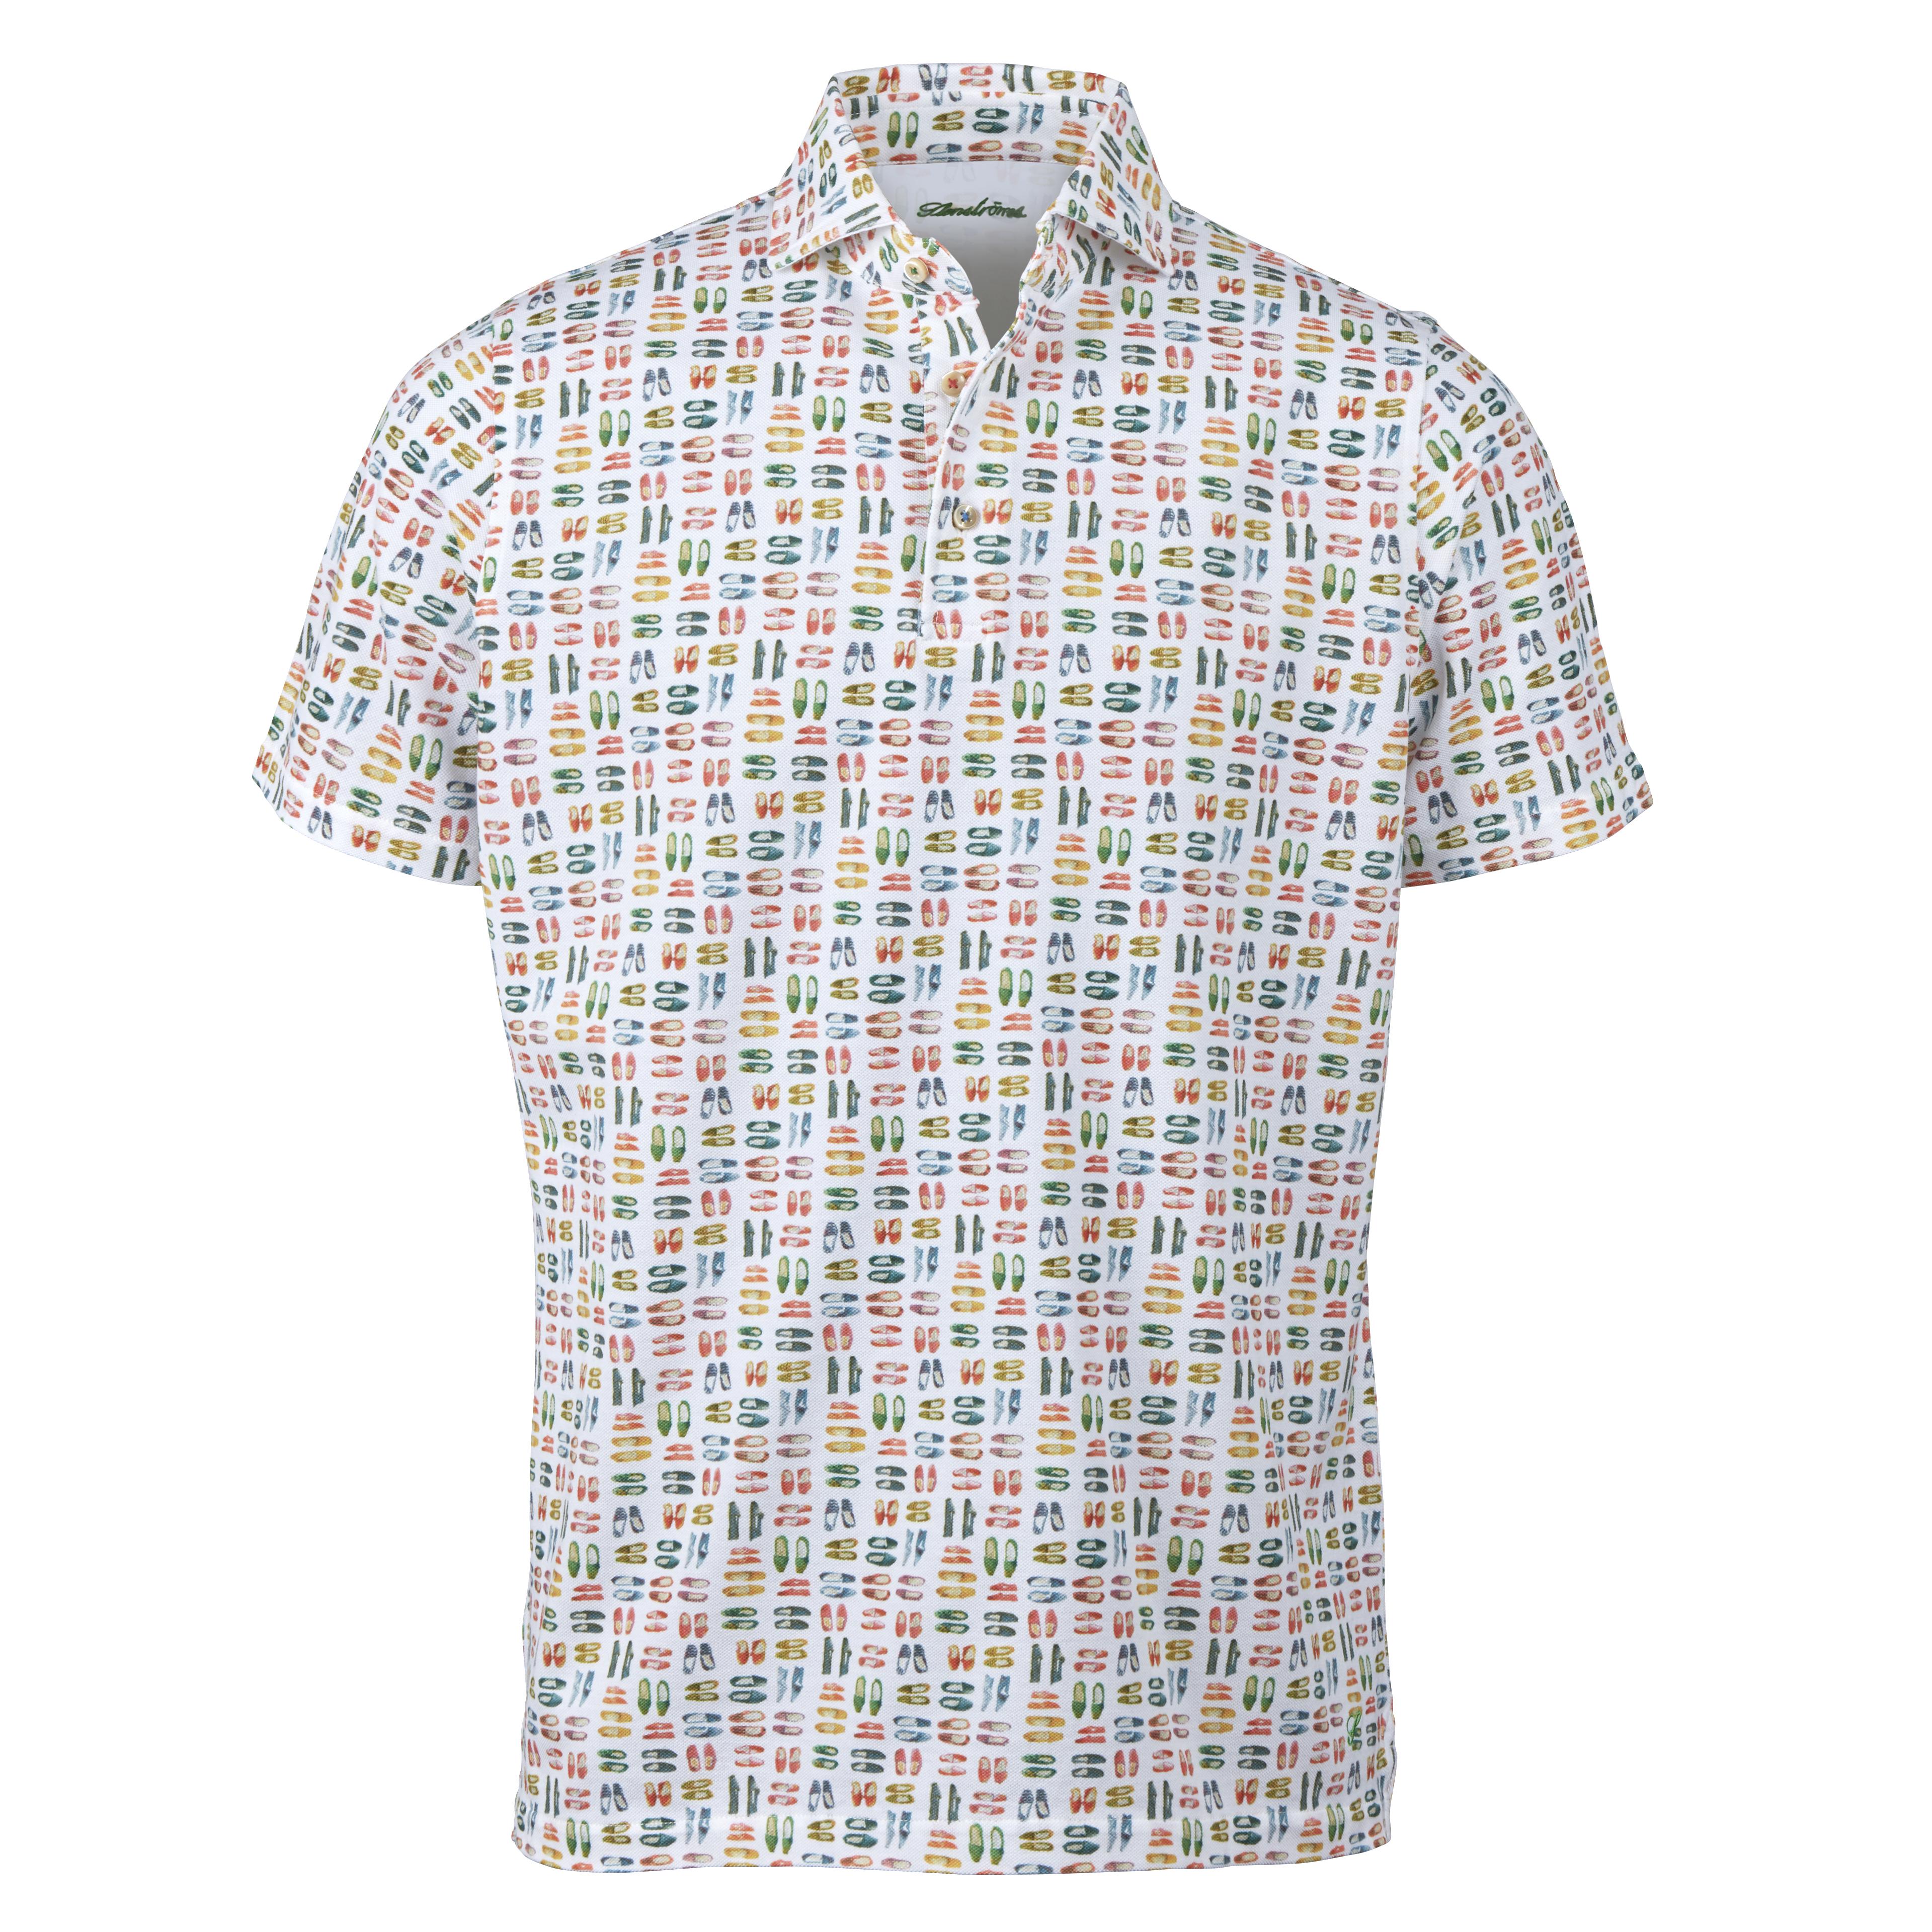 6838172dc371c Stenströms - Official Website - Swedish Shirtmaker since 1899